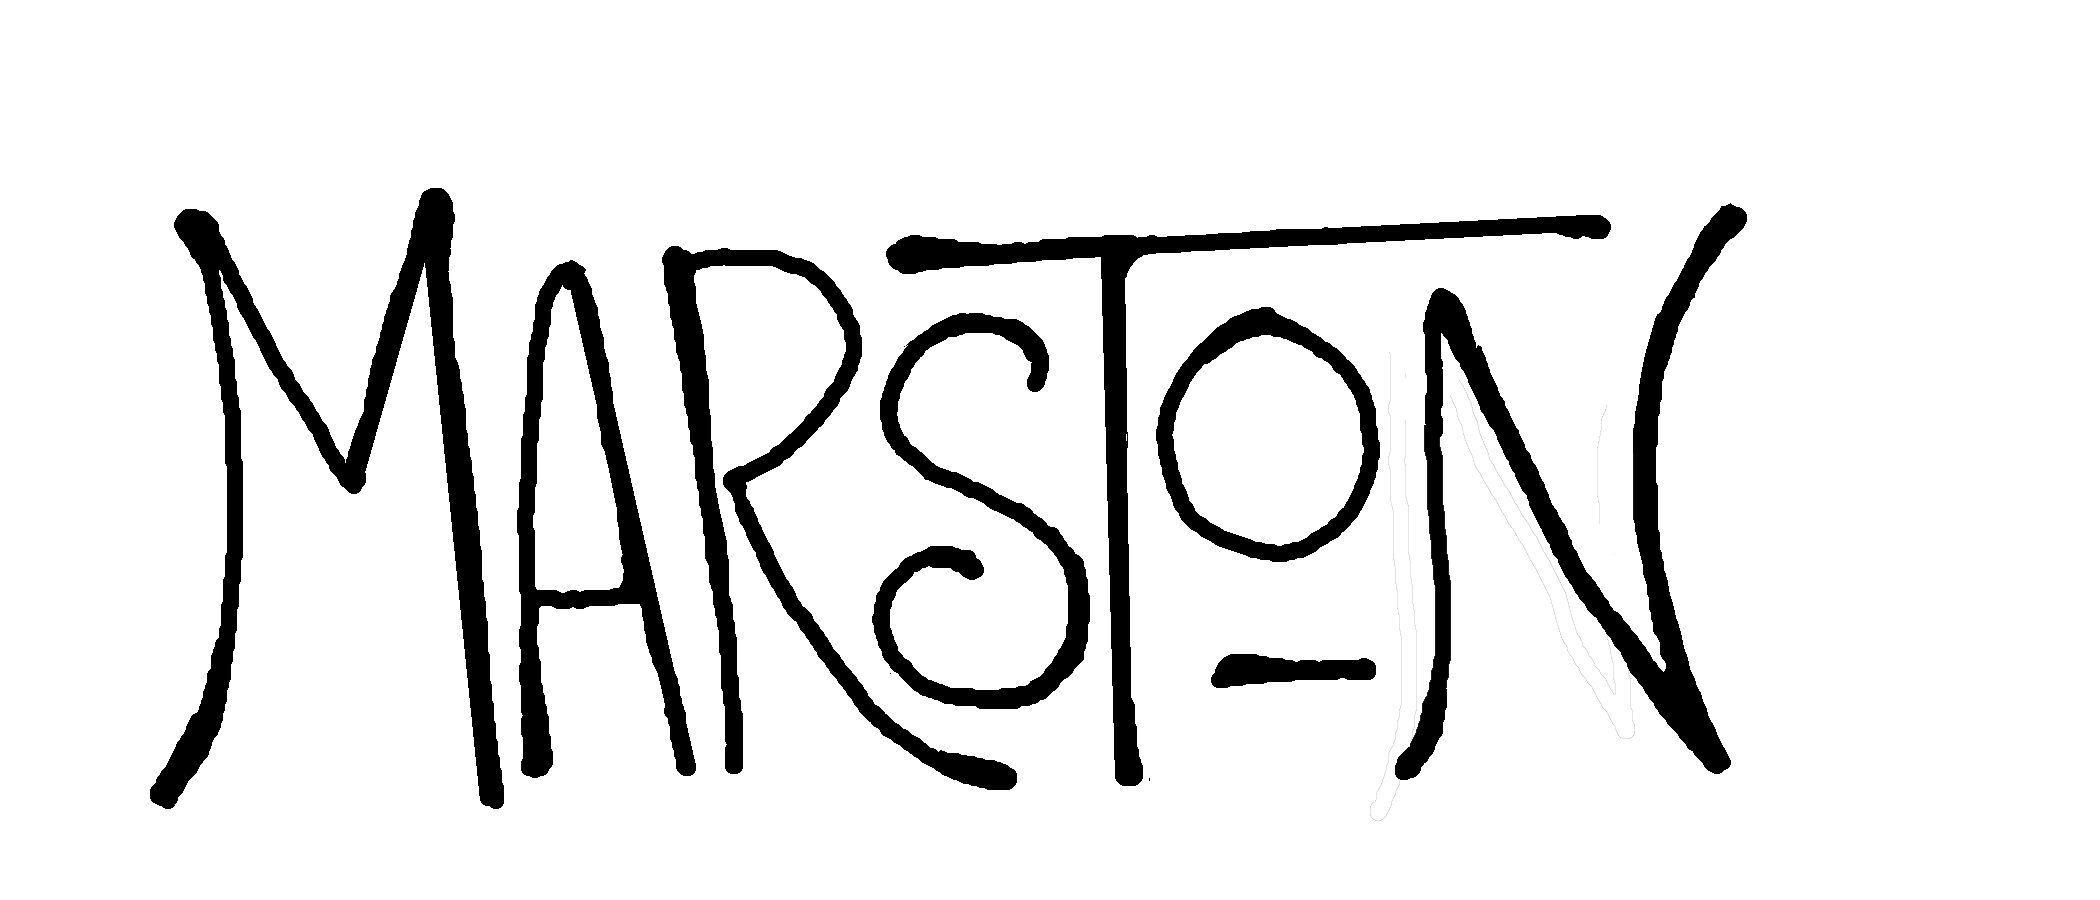 Sharon Marston Signature